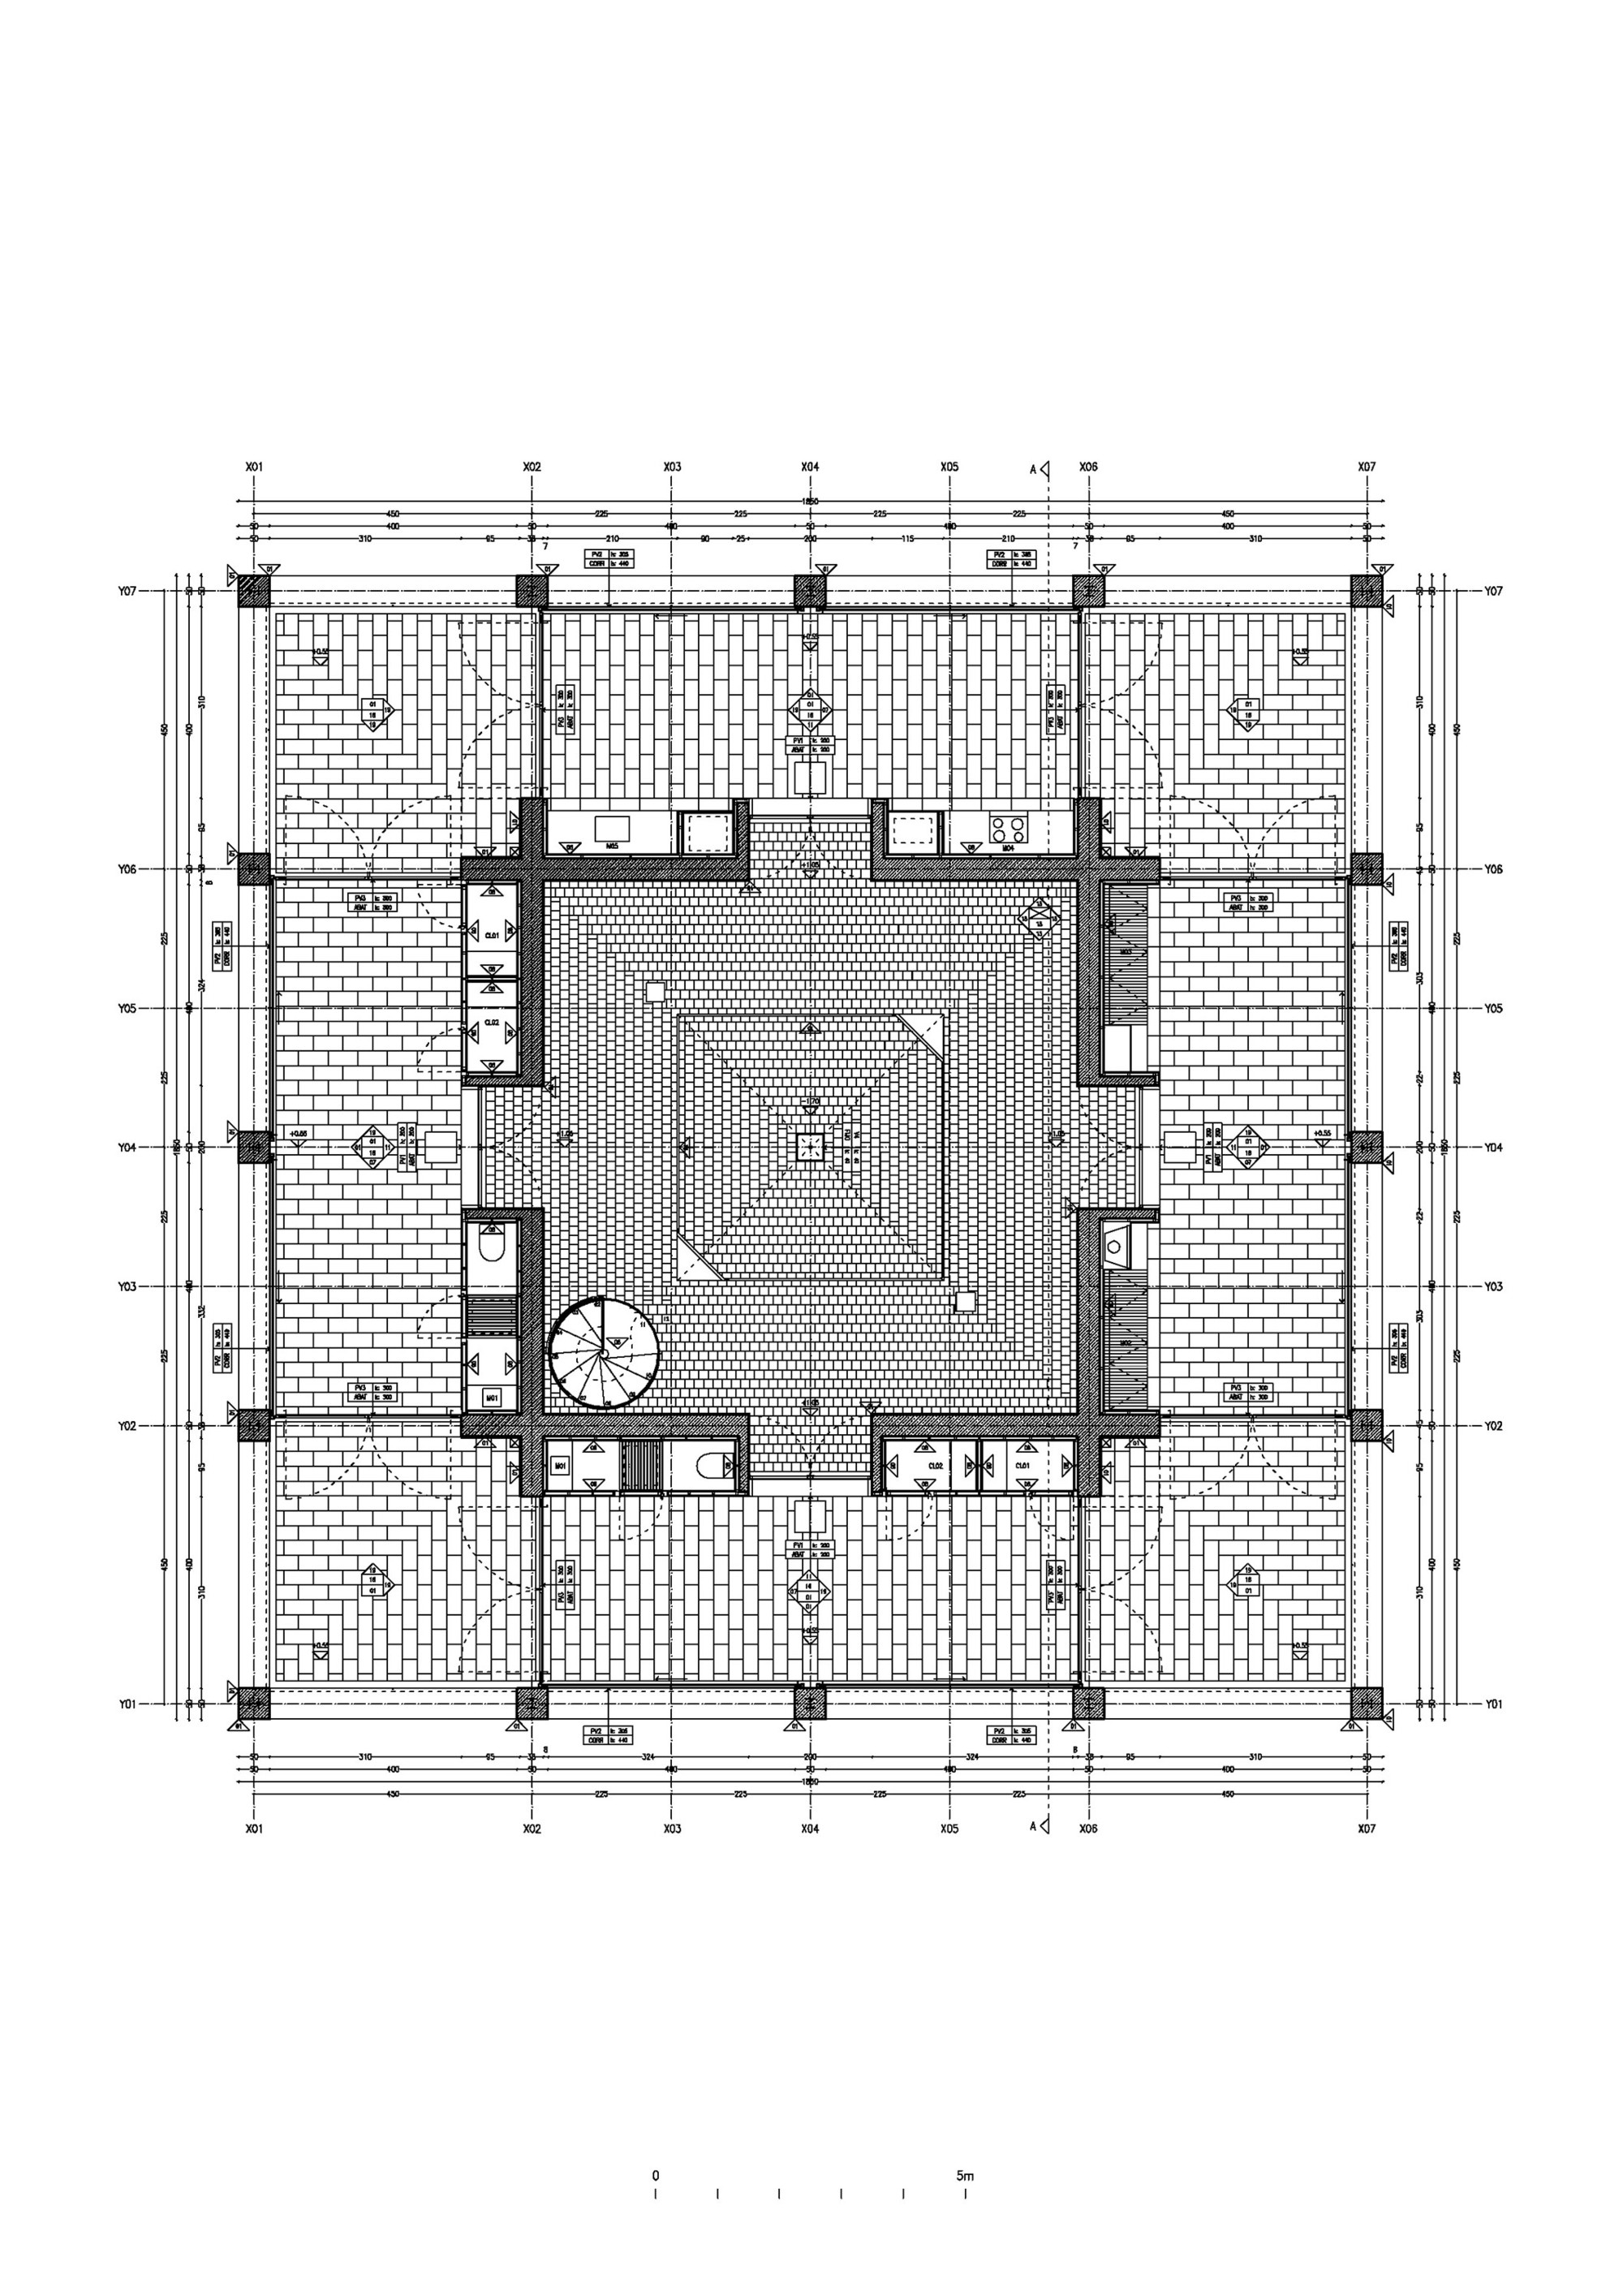 Galeria de solo house pezo von ellrichshausen 13 for Cbs construction home plans